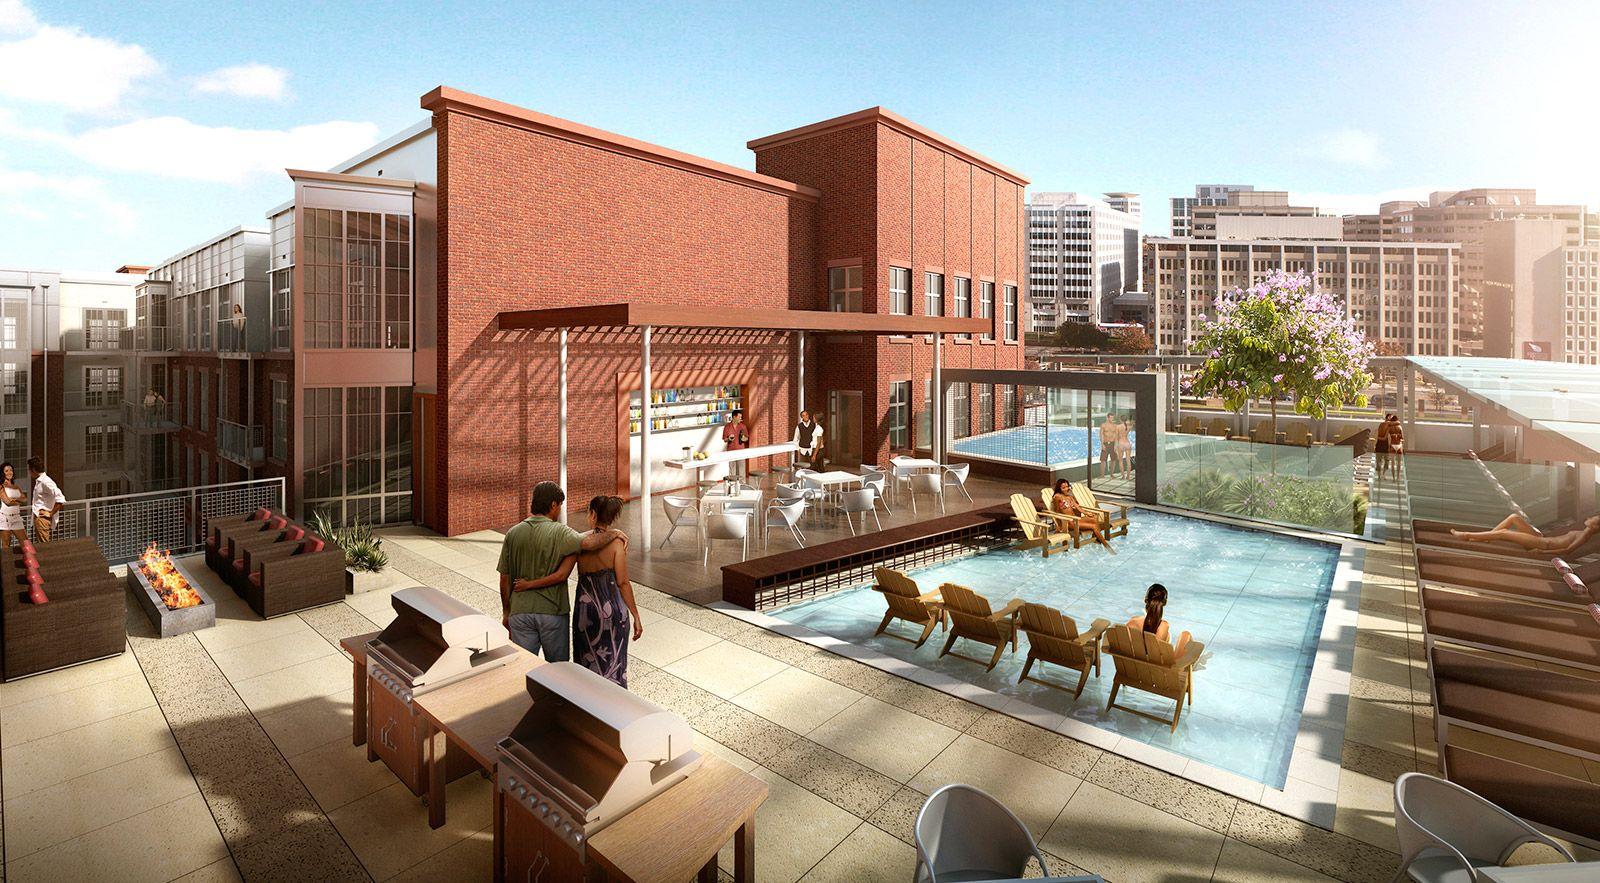 H Street Apartments Apartment Rentals In Washington Dc 77h